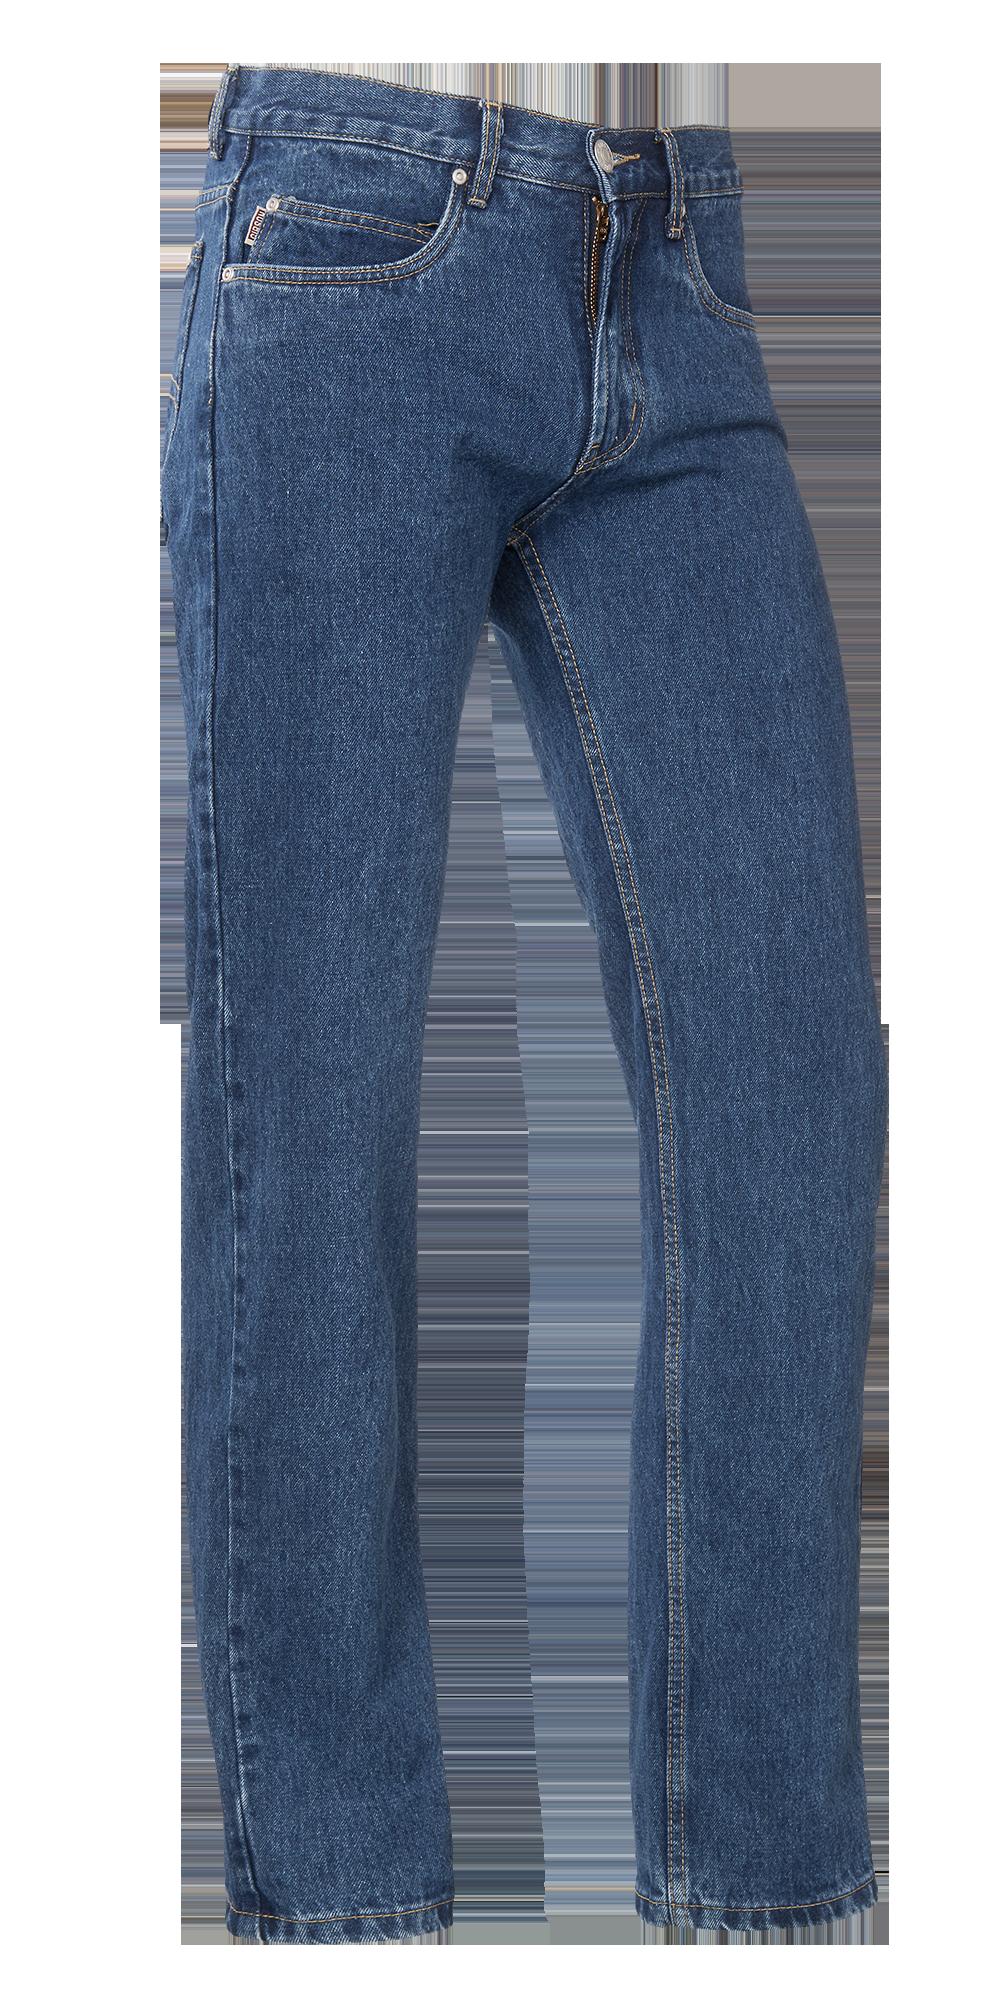 arbeitshosen jeans f r herren jeans produkte hotel. Black Bedroom Furniture Sets. Home Design Ideas